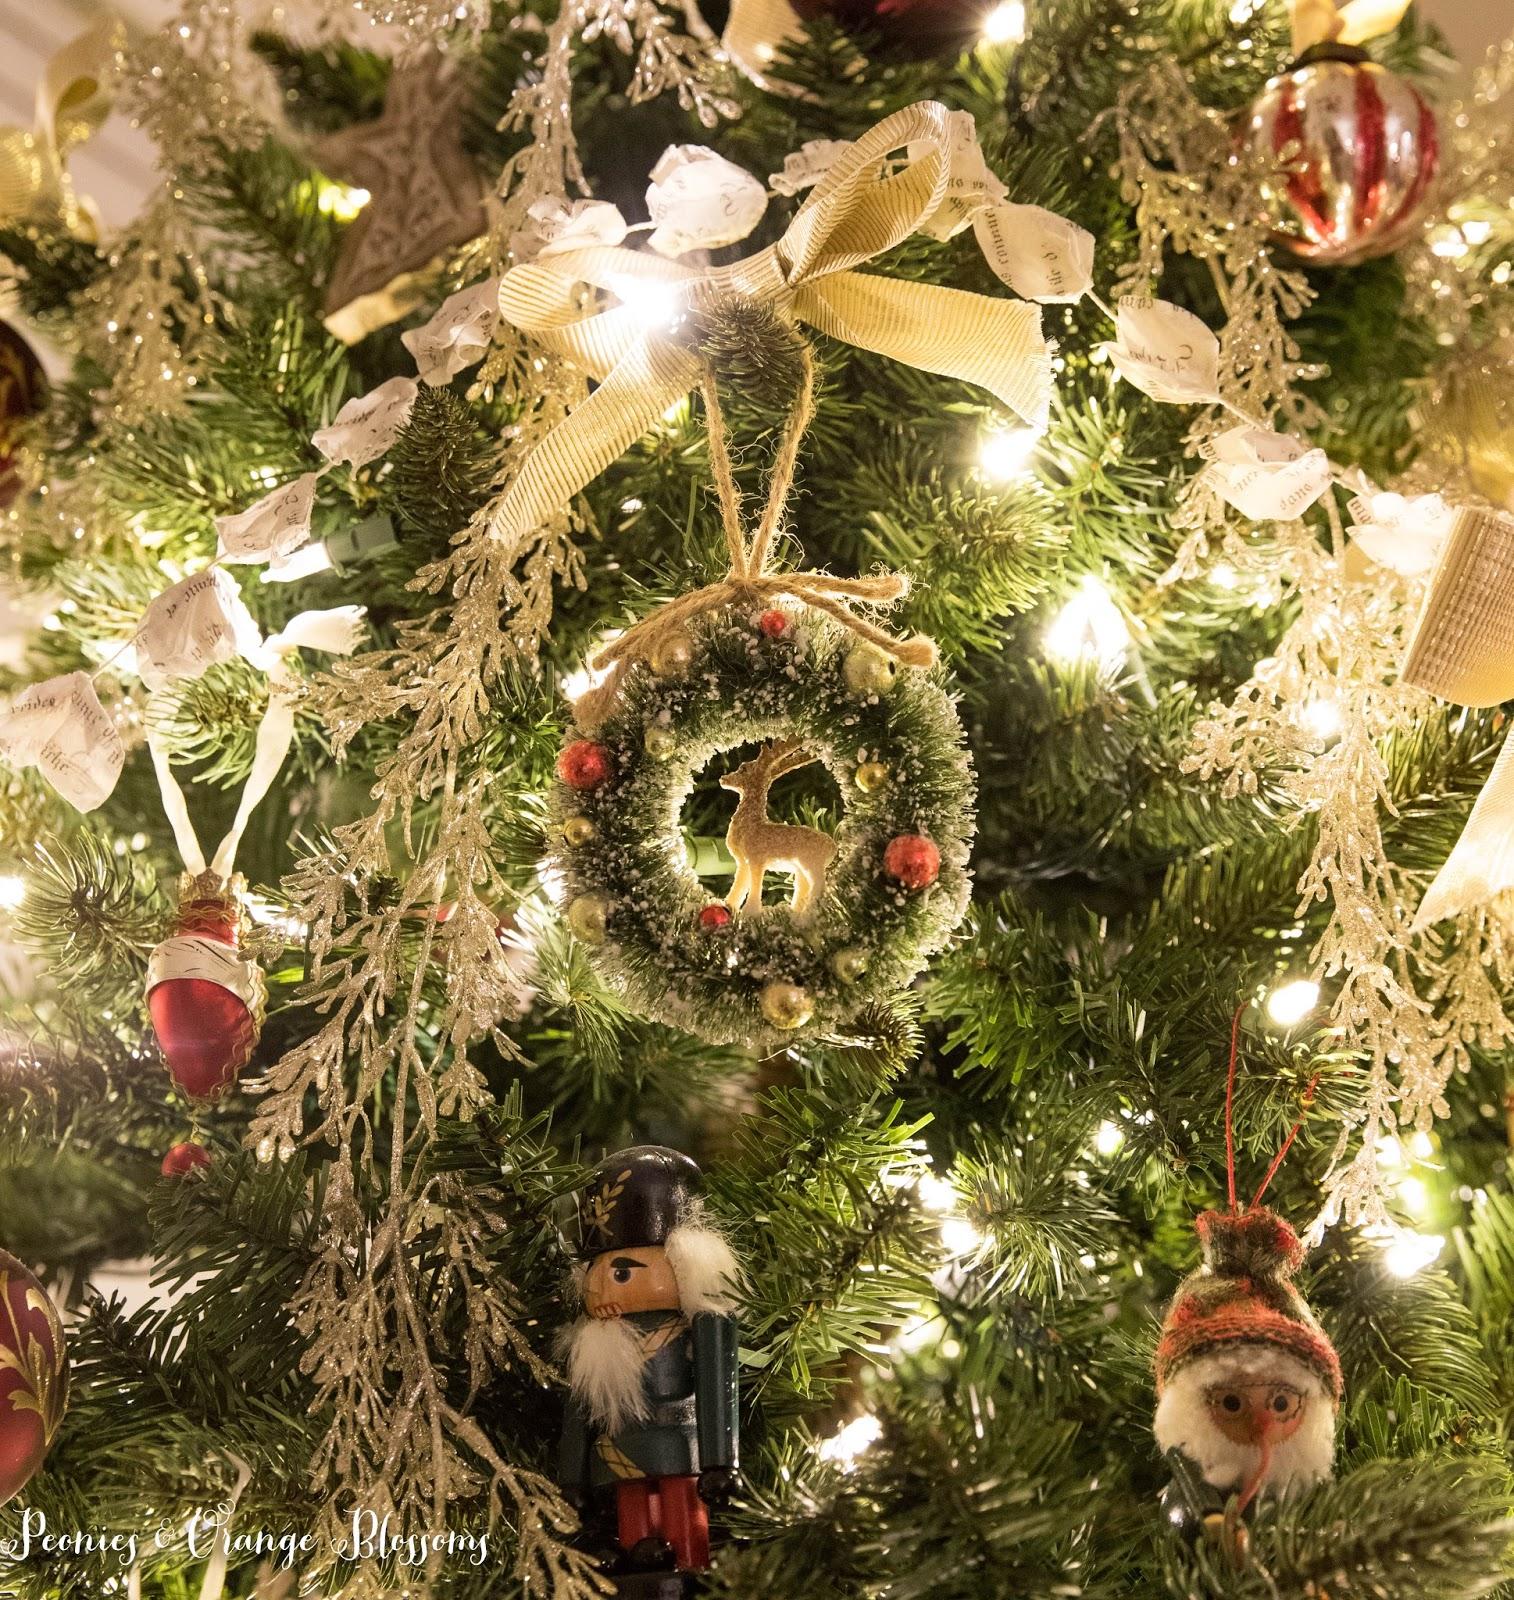 Vintage christmas tree ornaments - Classic Vintage Christmas Tree Ornament Ideas